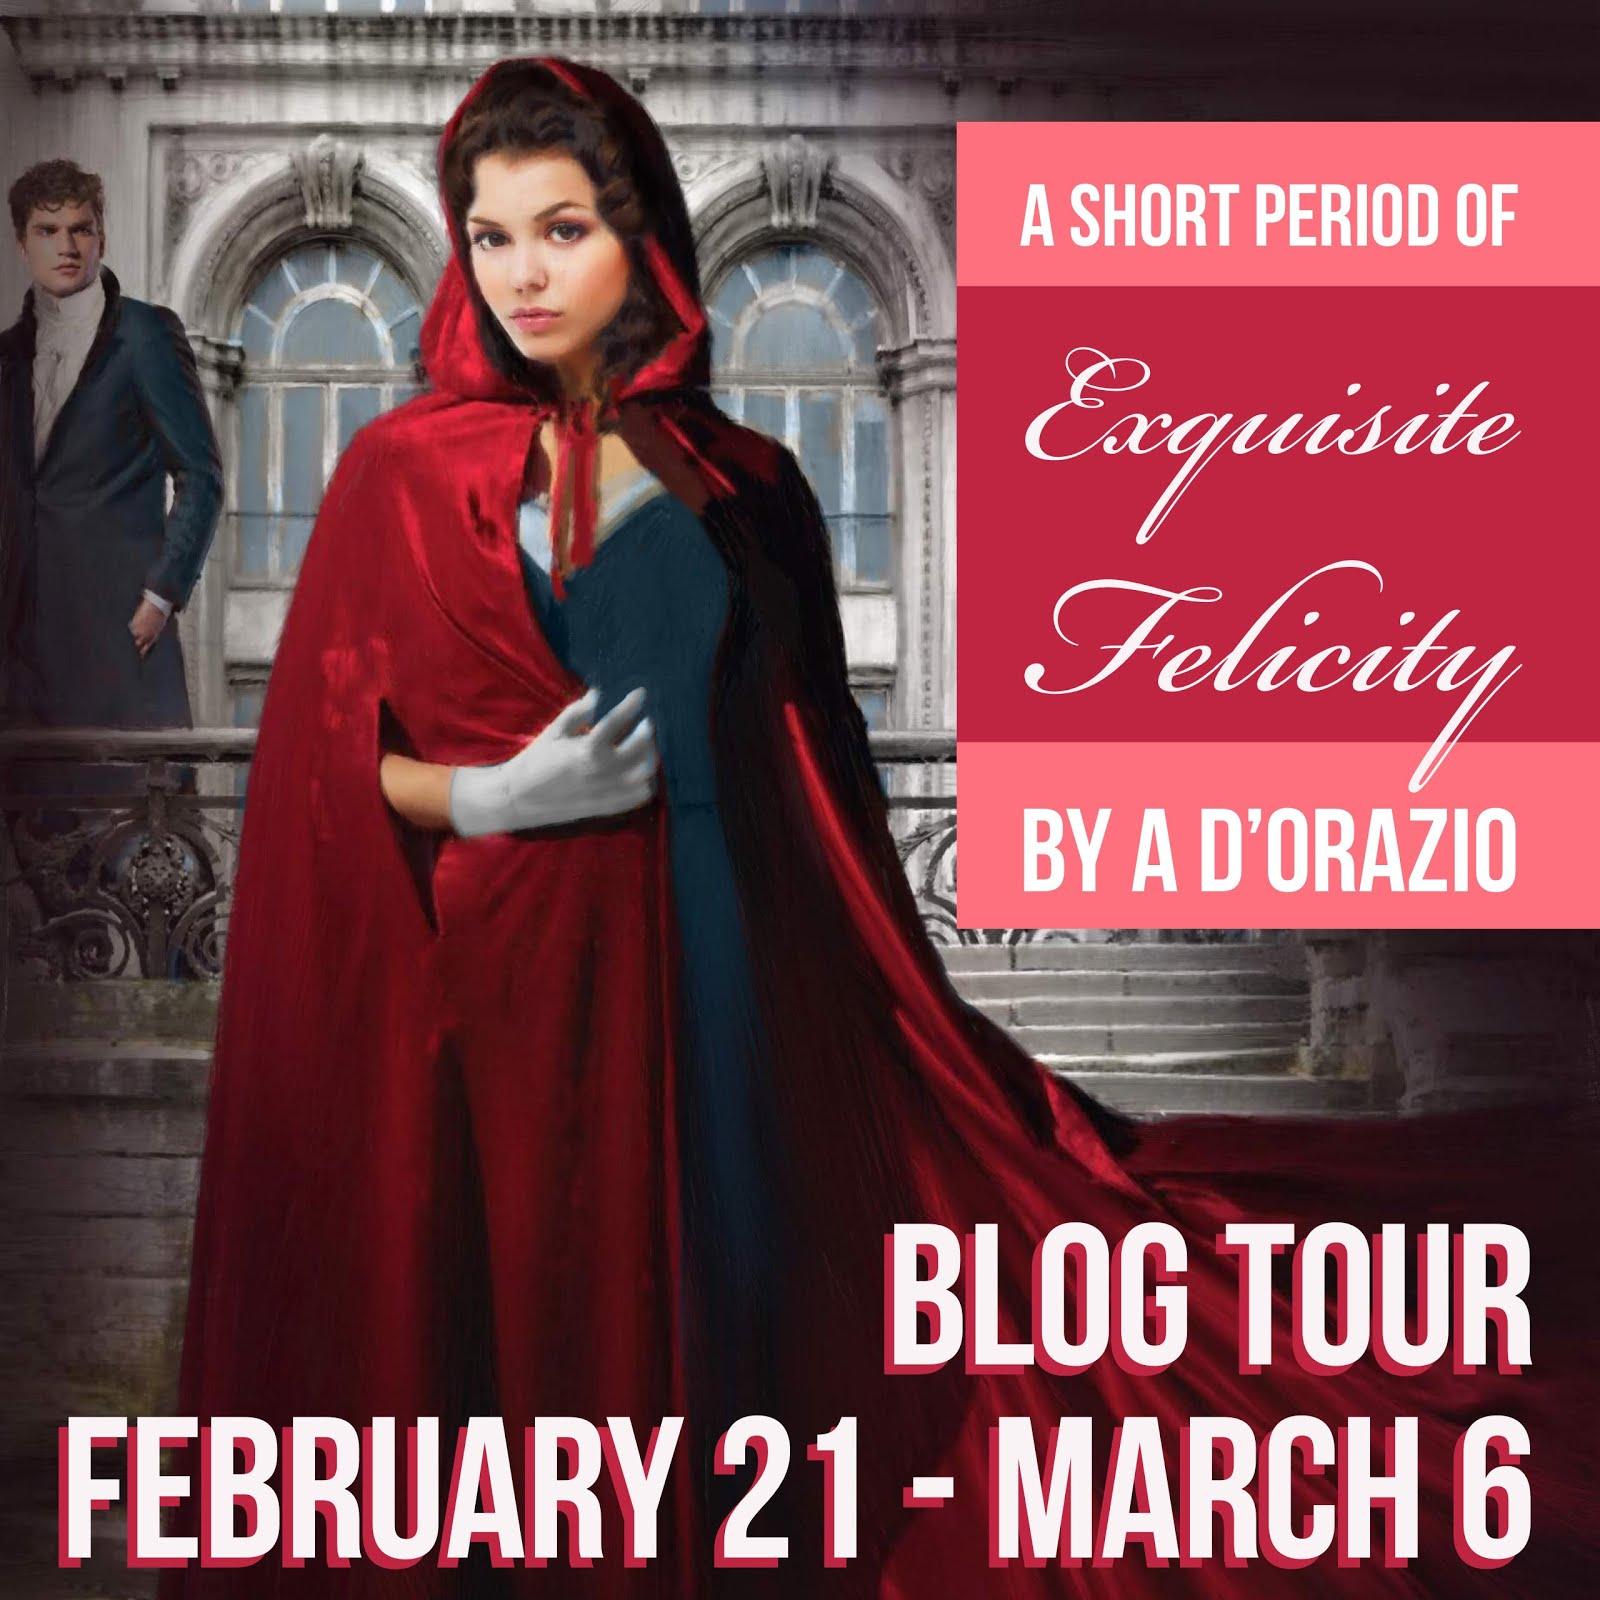 A Short Period of Exquisite Felicity, By A. D'Orazio - Blog Tour